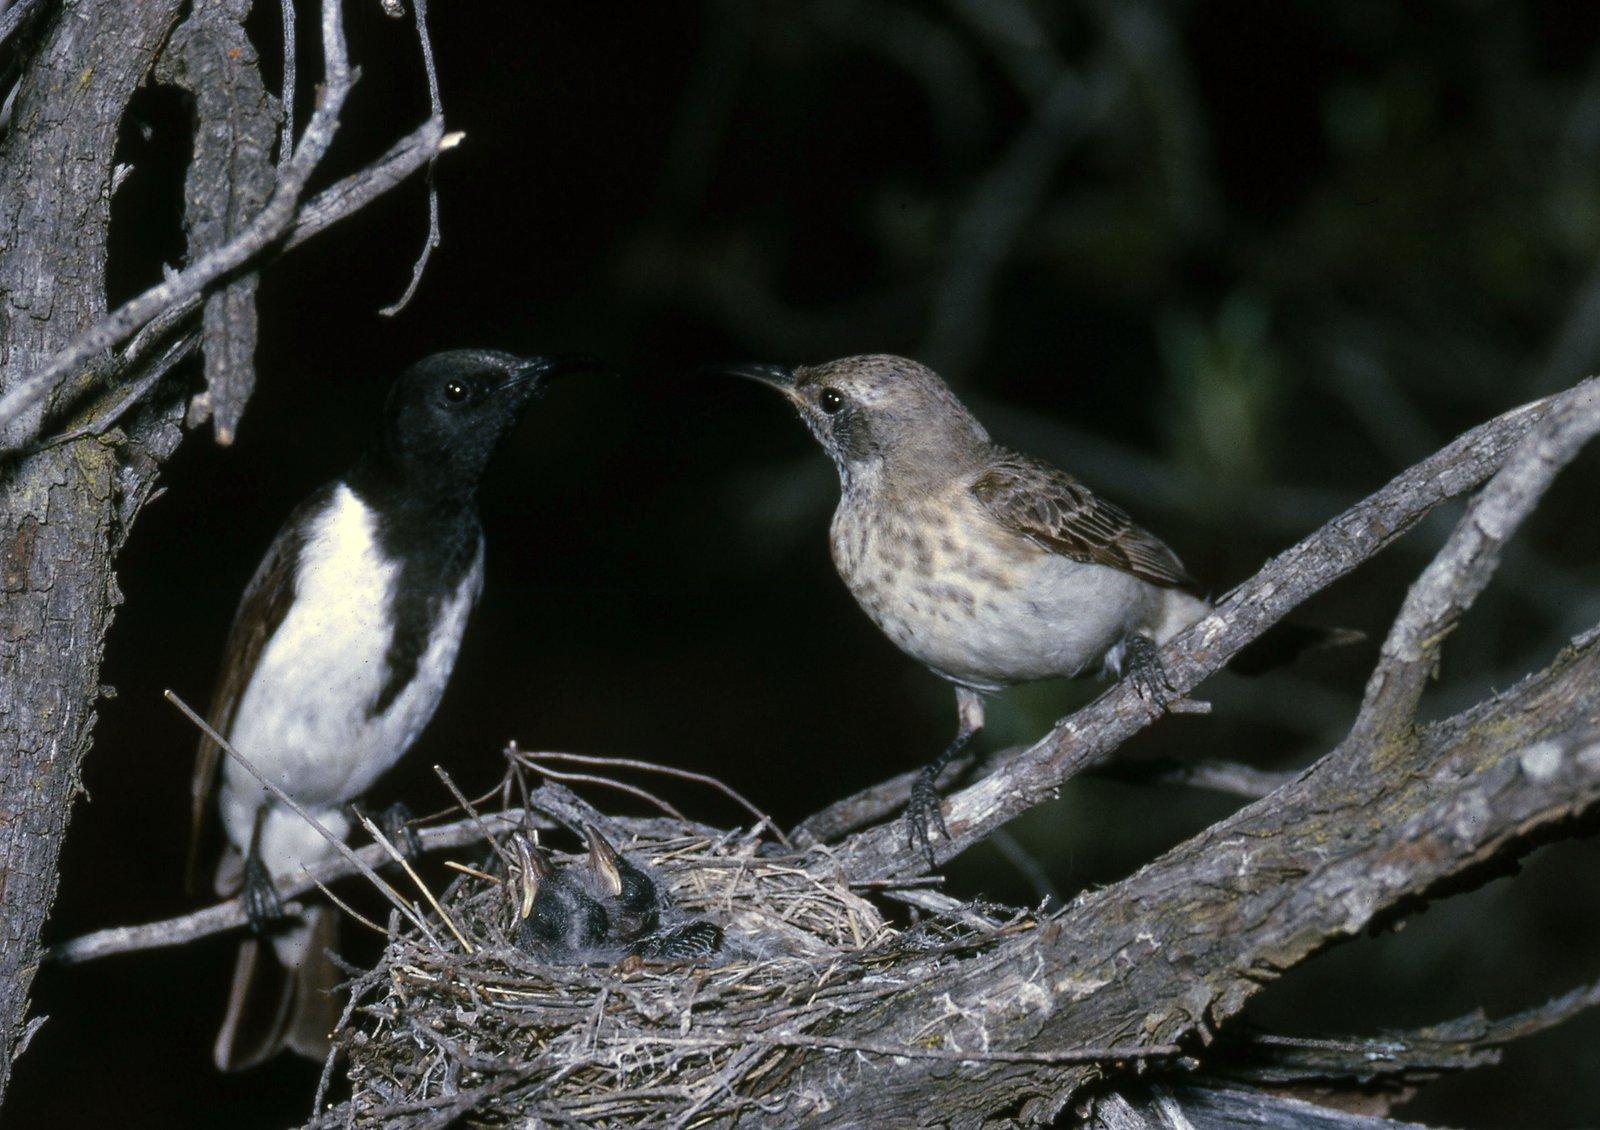 Black Honeyeater, Certhionyx niger